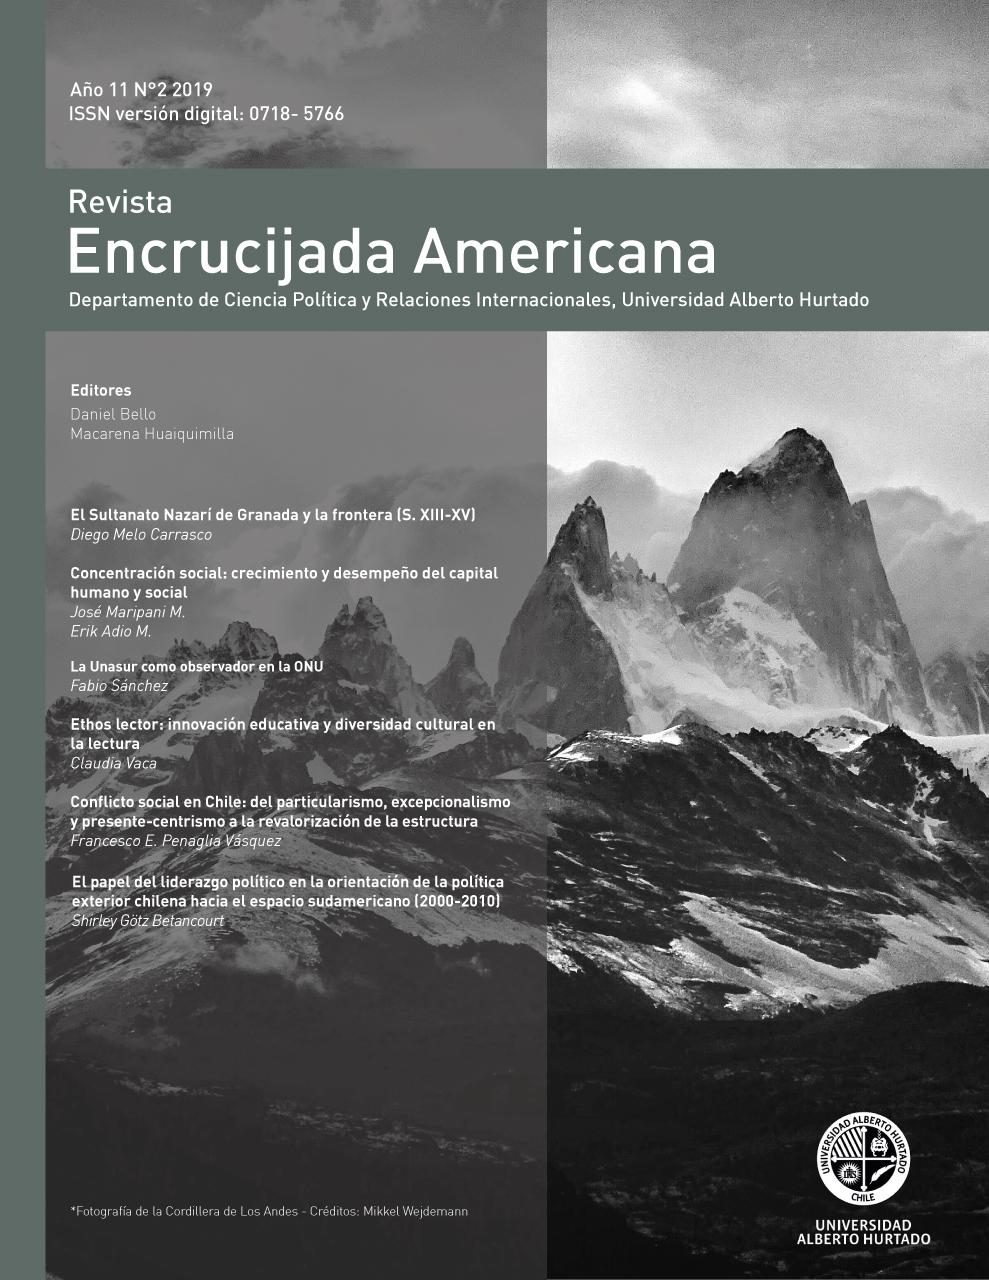 Revista Encrucijada Americana